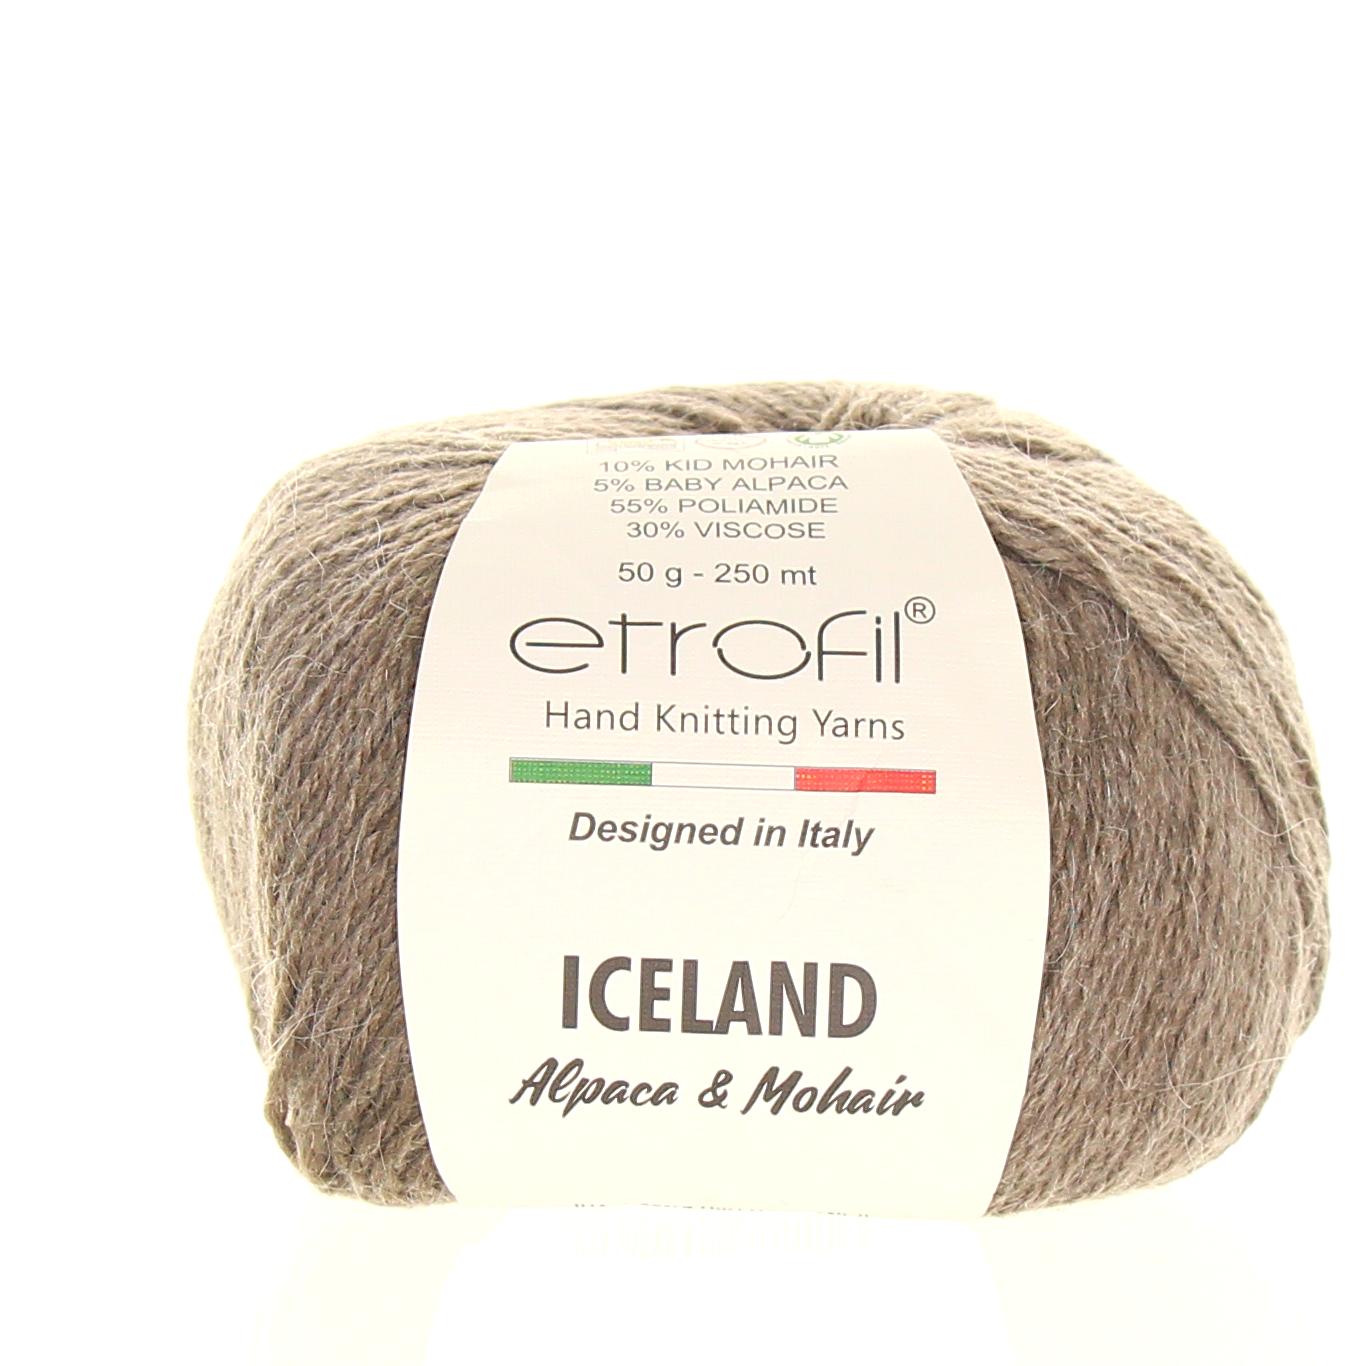 ETROFIL_ICELAND_06136_FULL